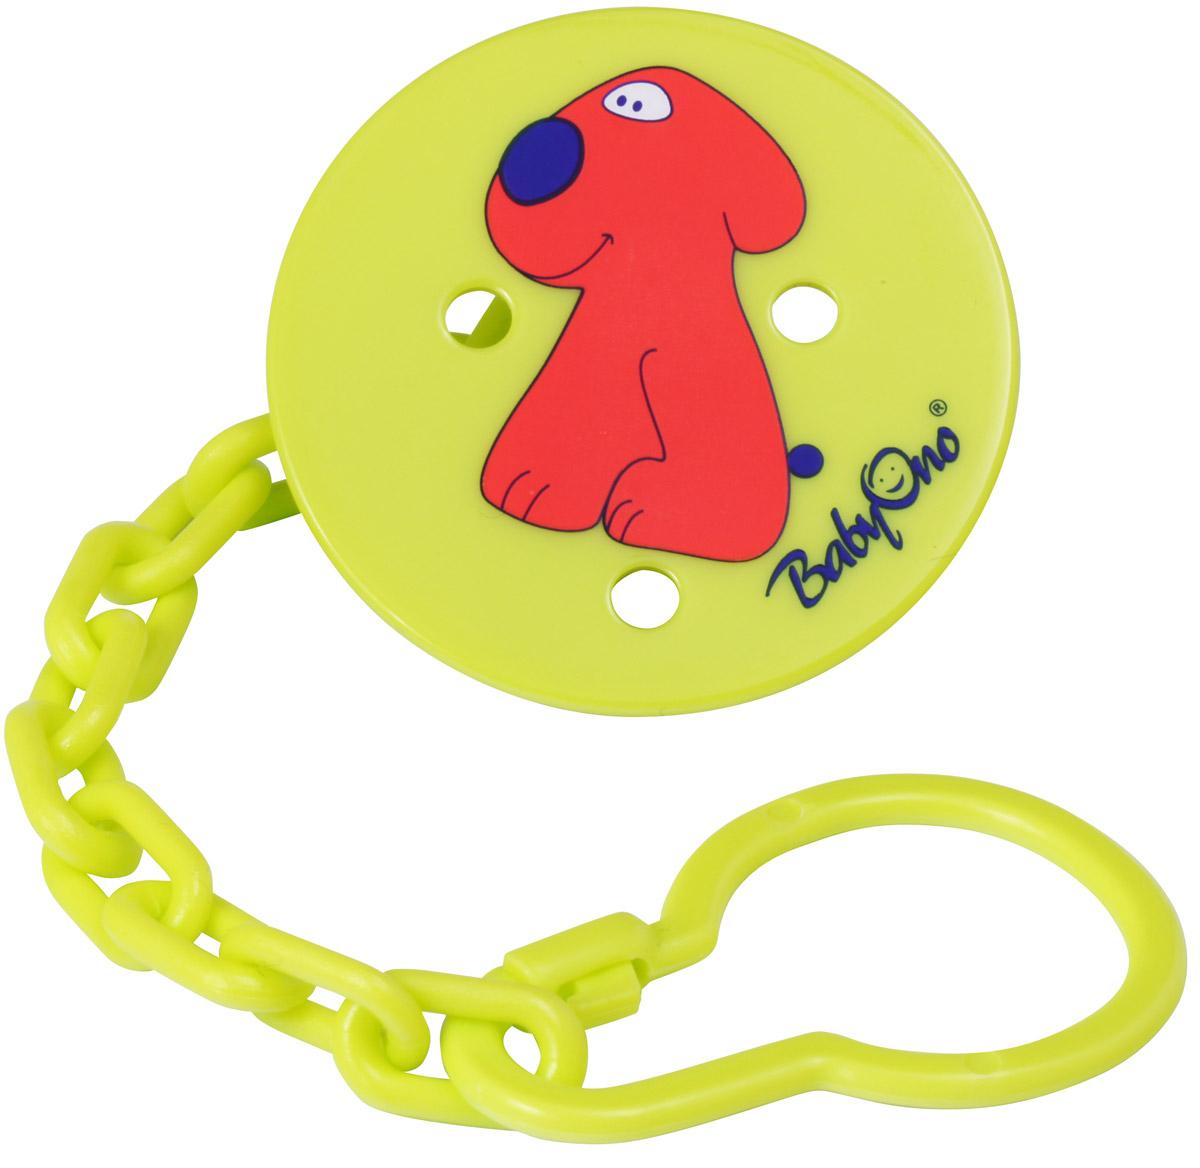 BabyOno Клипса-держатель для пустышки Собачка babyono клипса держатель для пустышки коровка цвет бежевый